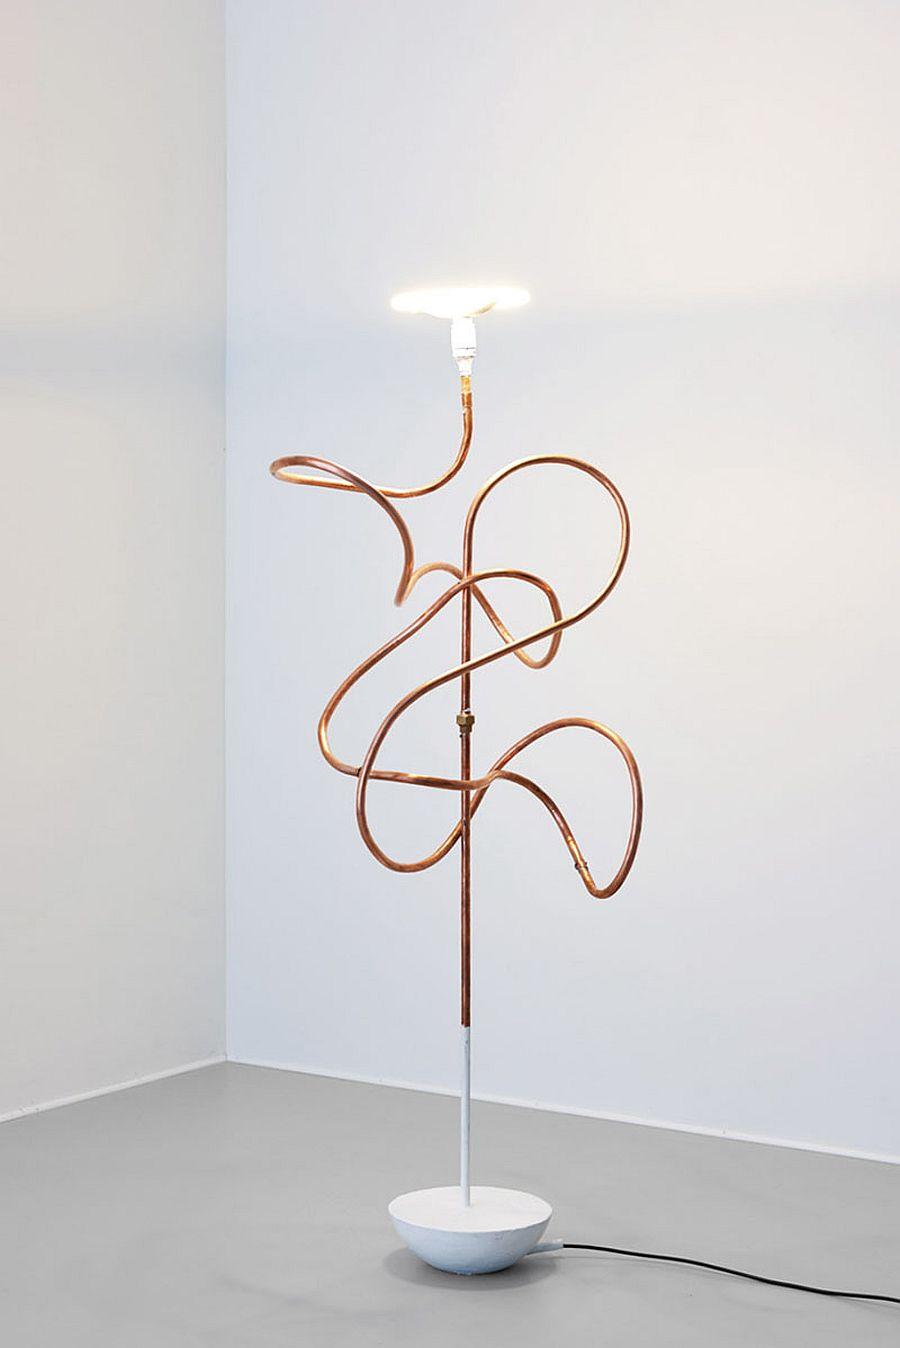 Sculptural-Bent-Copper-Tubing-Light-DIY-is-simply-stunning